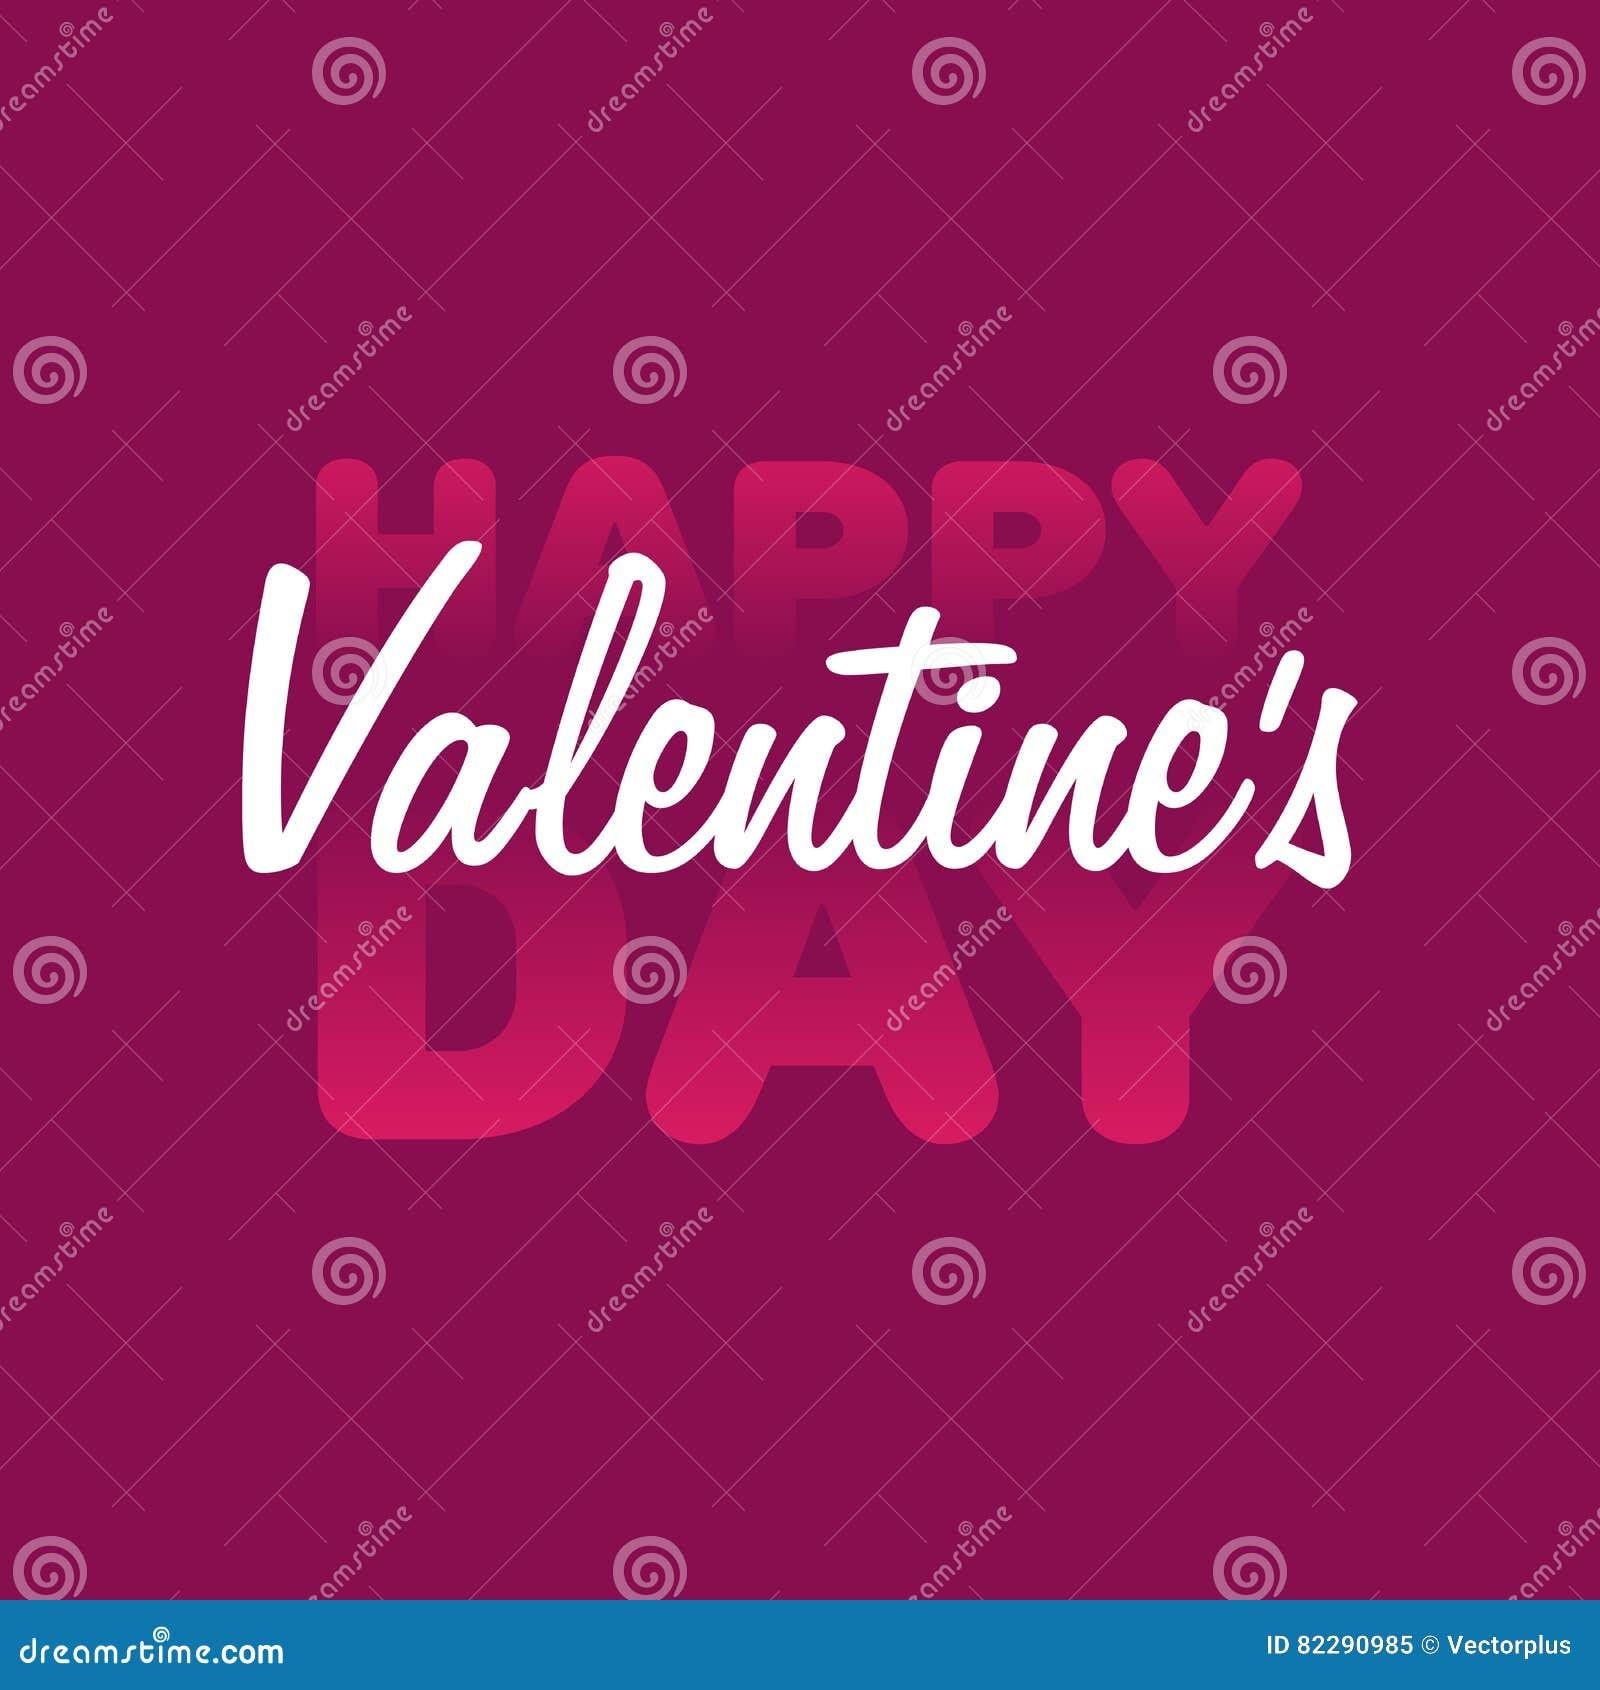 Valentine. Valentine Day and Love lettering illustration. White lettering on pink background. Postcard